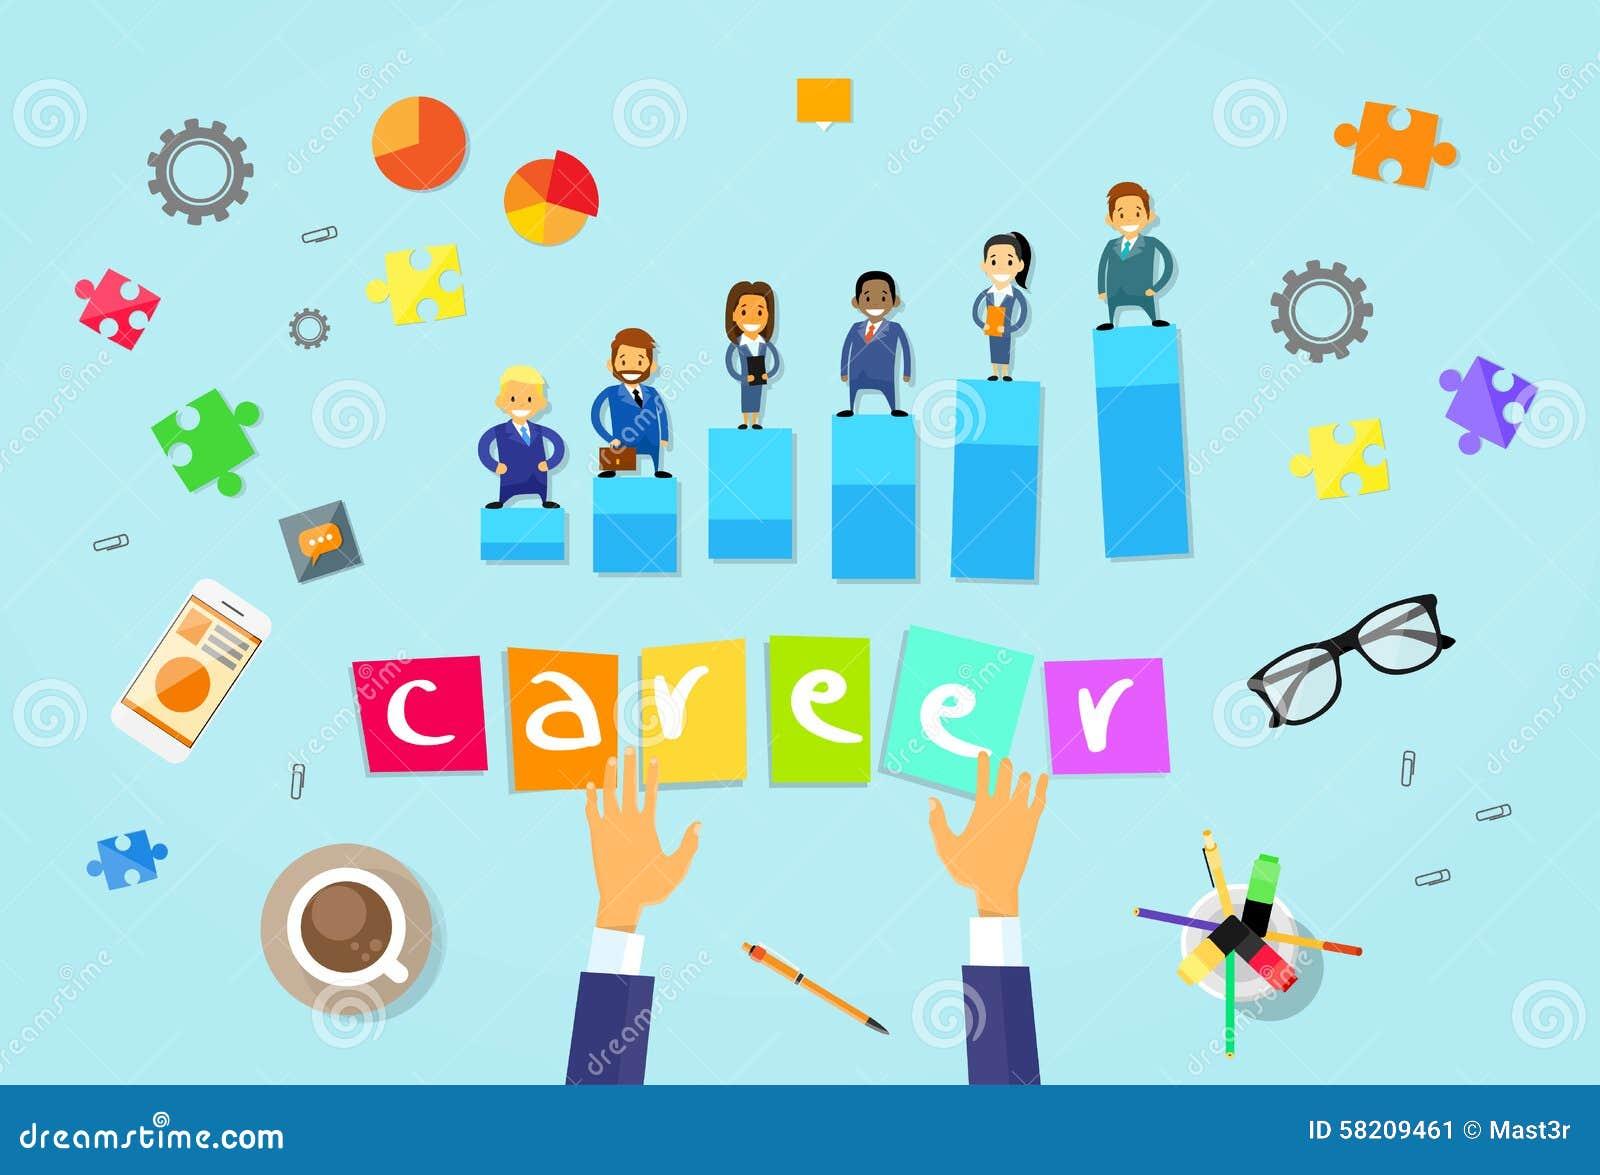 Business People Career Concept Cartoon Stock Vector Illustration Of Businesswoman Hiring 58209461